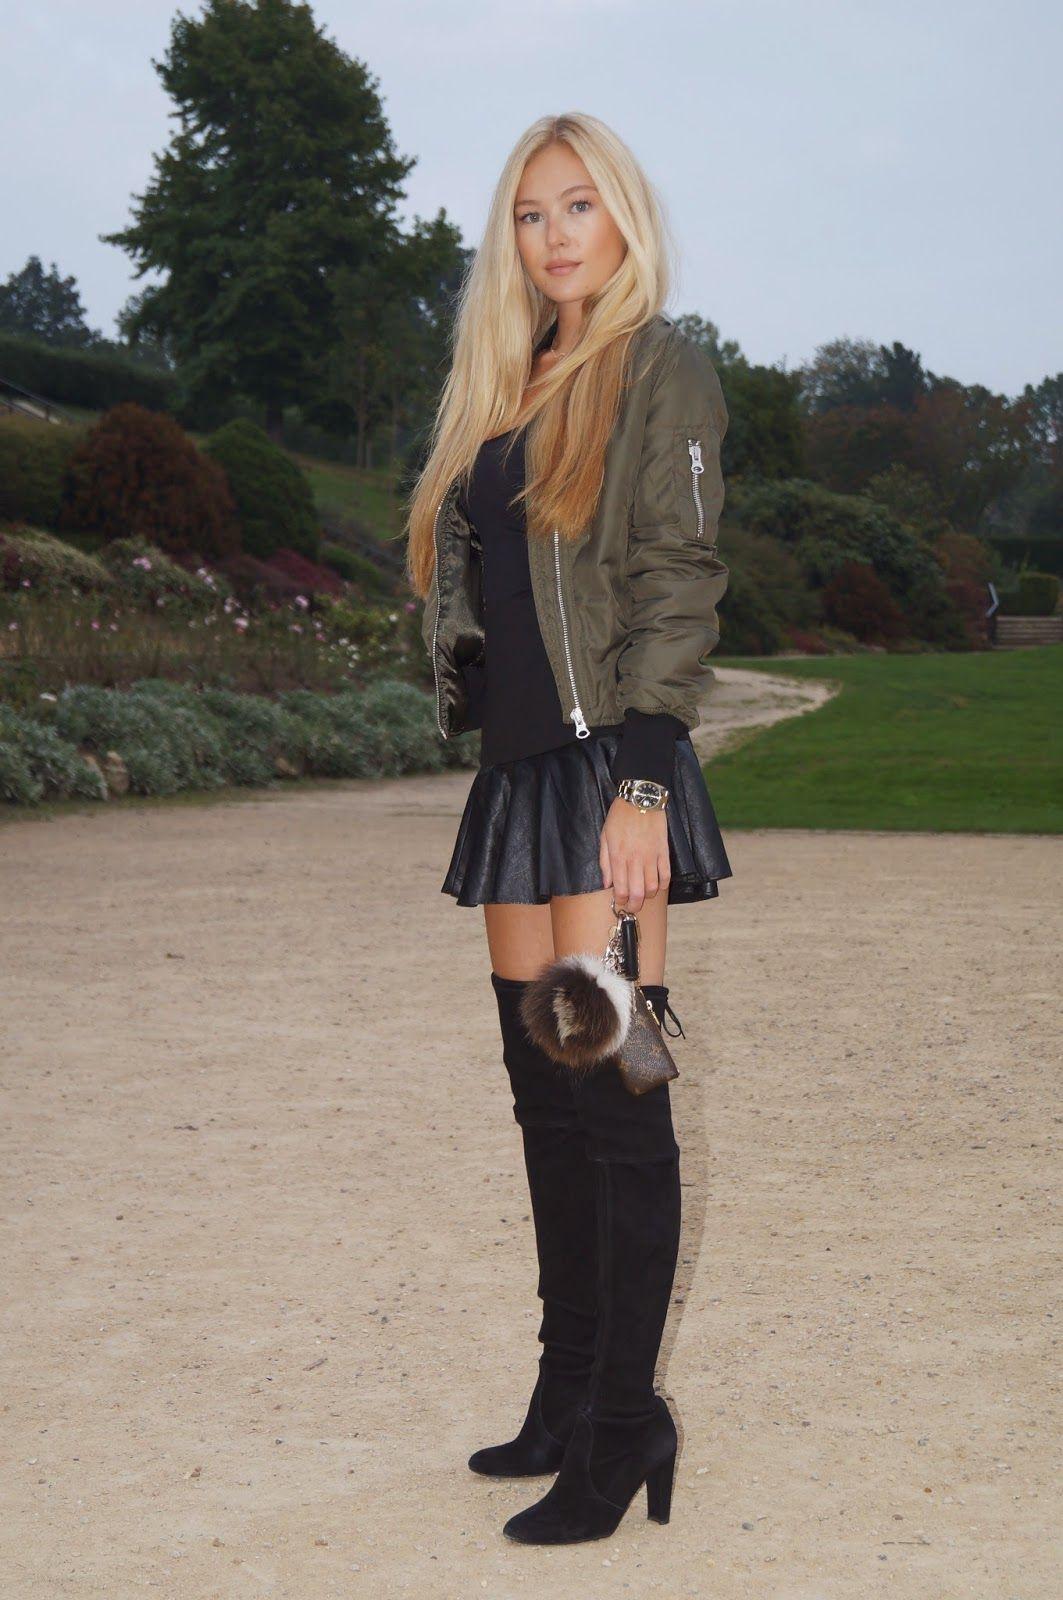 63e2308a8ab Fashion blogger holliehobin in Stuart Weitzman Highland stretch  over-the-knee boots Jacket - Topshop Top - Forever 21 Skirt - Zara Source   holliehobin ...